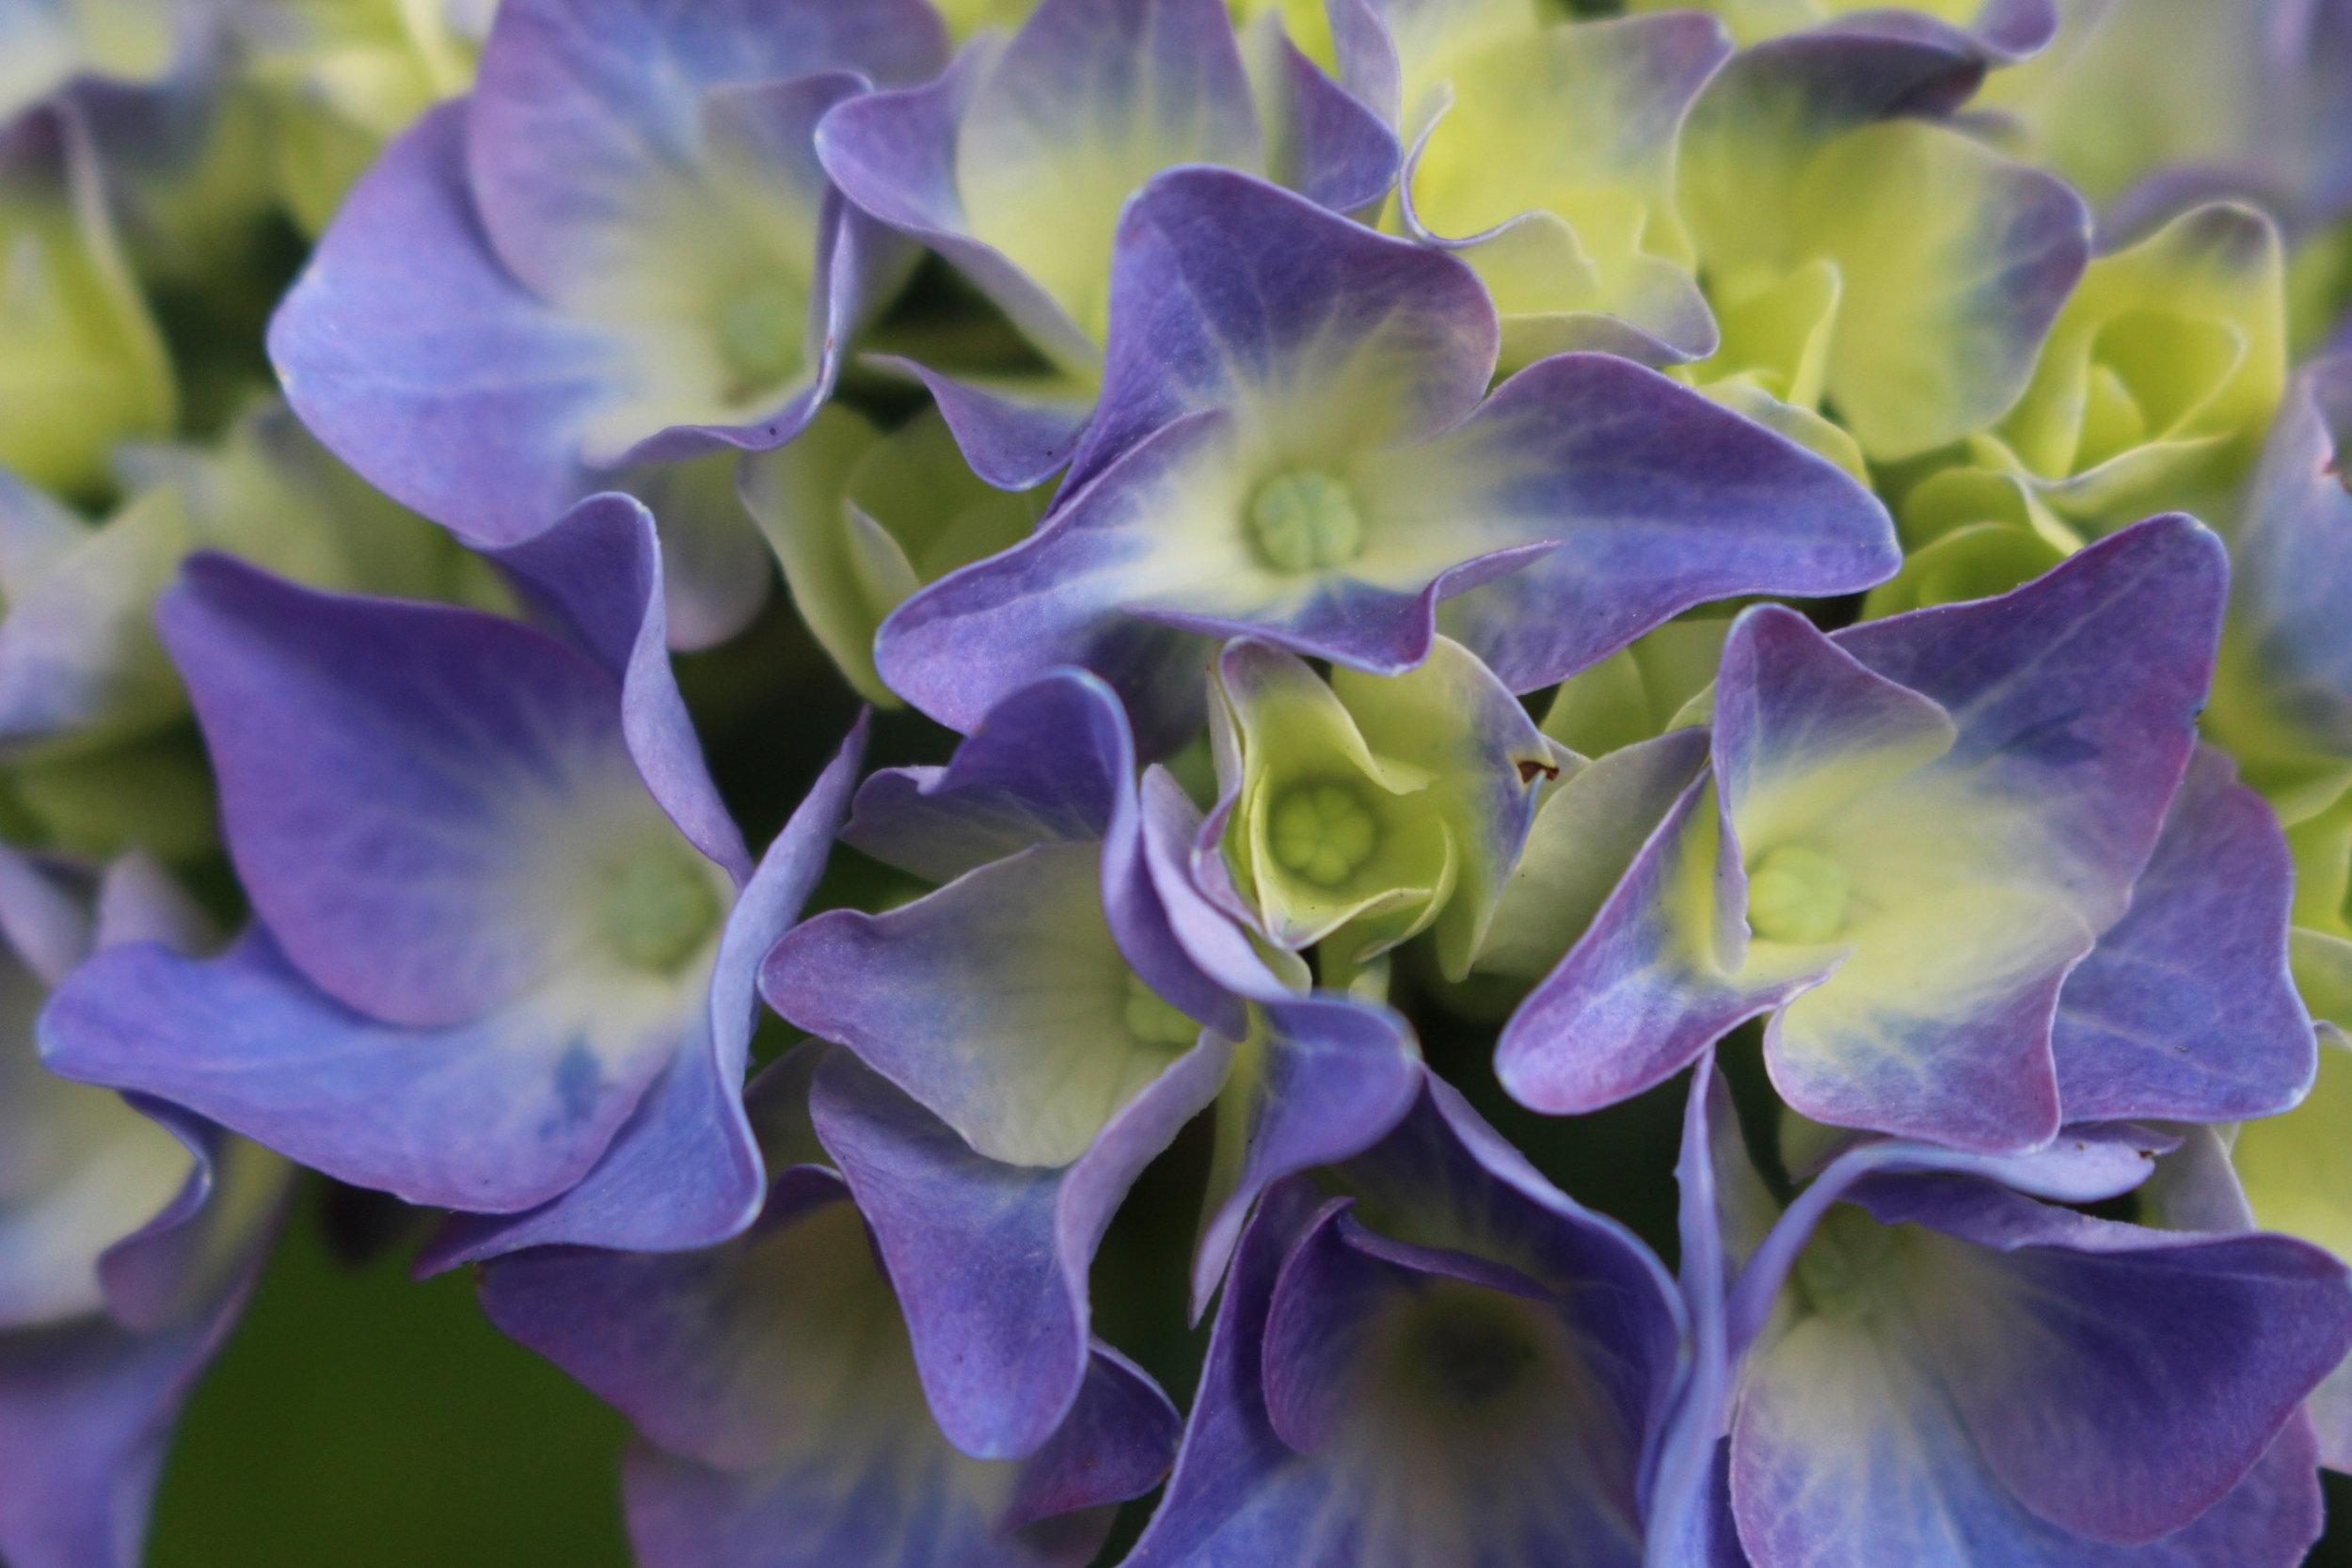 #65 Hydrangea, Hydrangea macrophylla